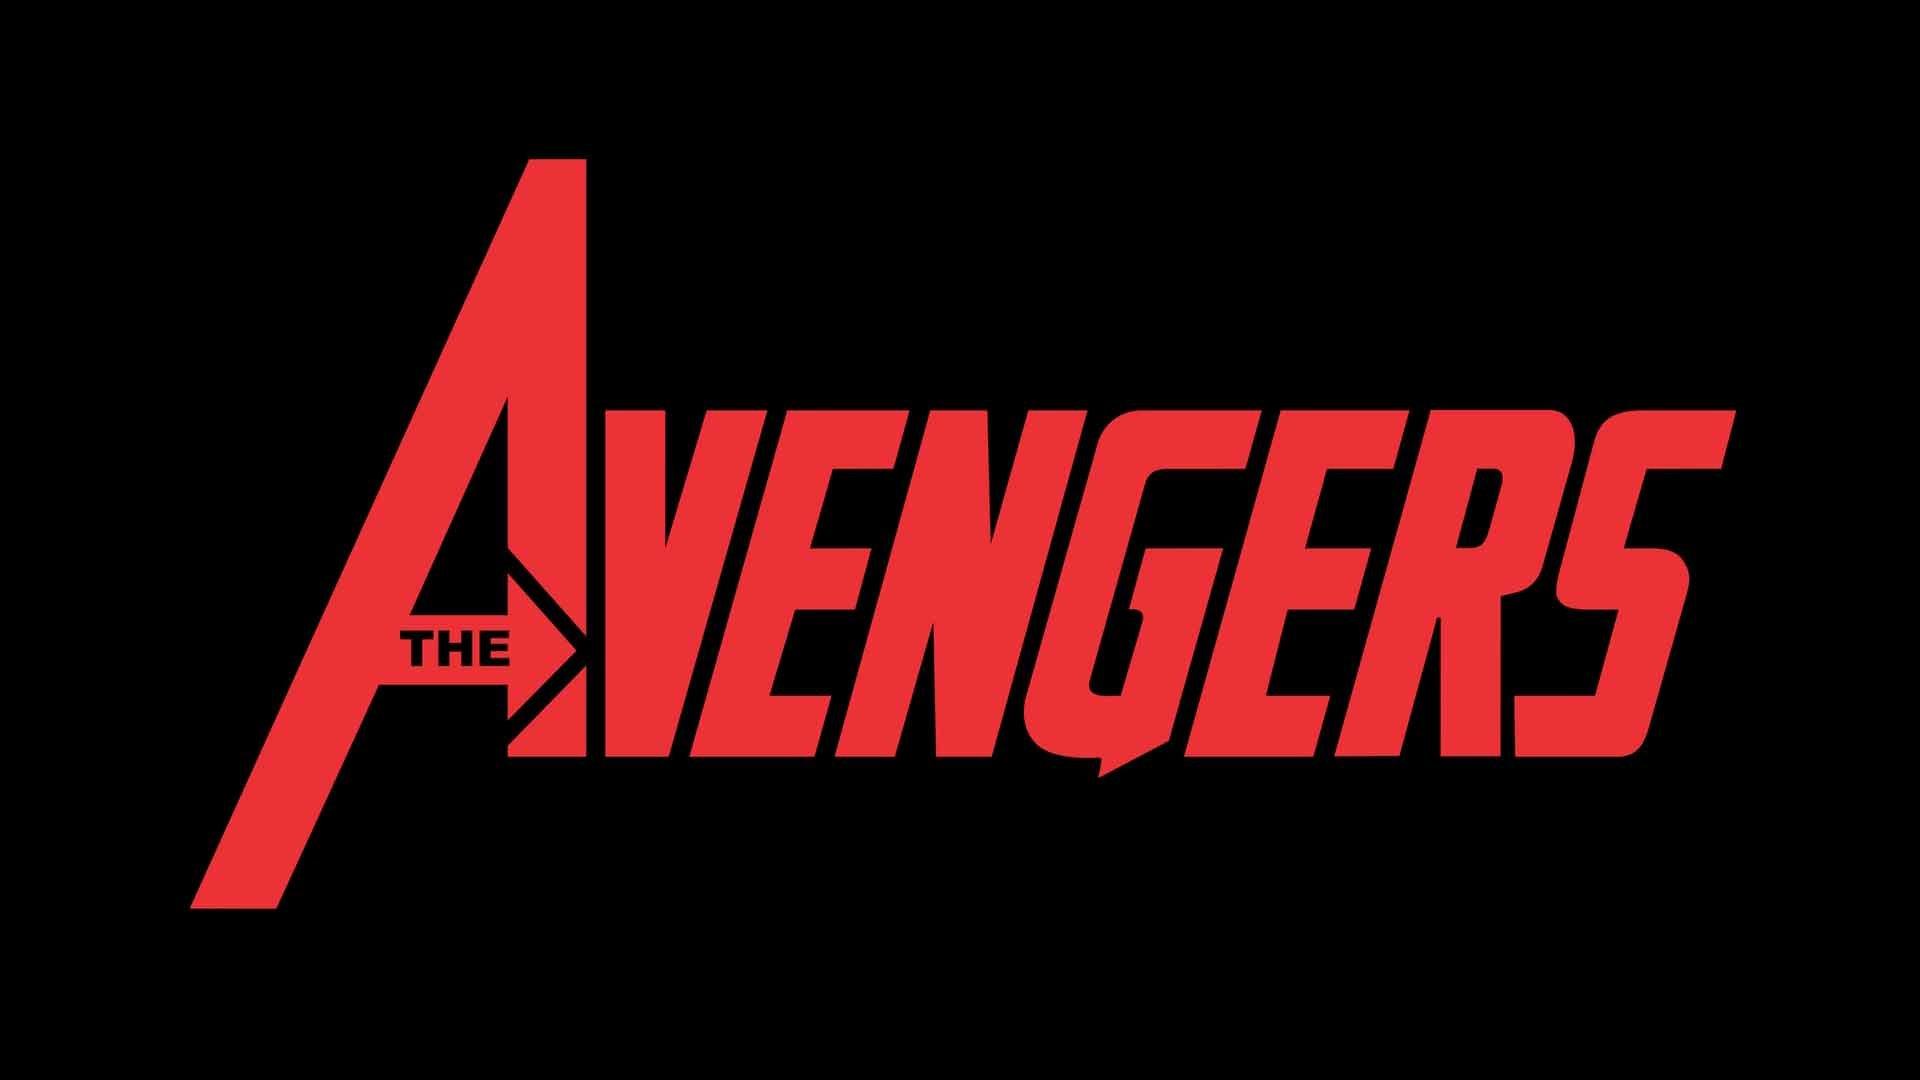 Free Download Avengers Comics Wallpaper Id 334501 Full Hd For Desktop